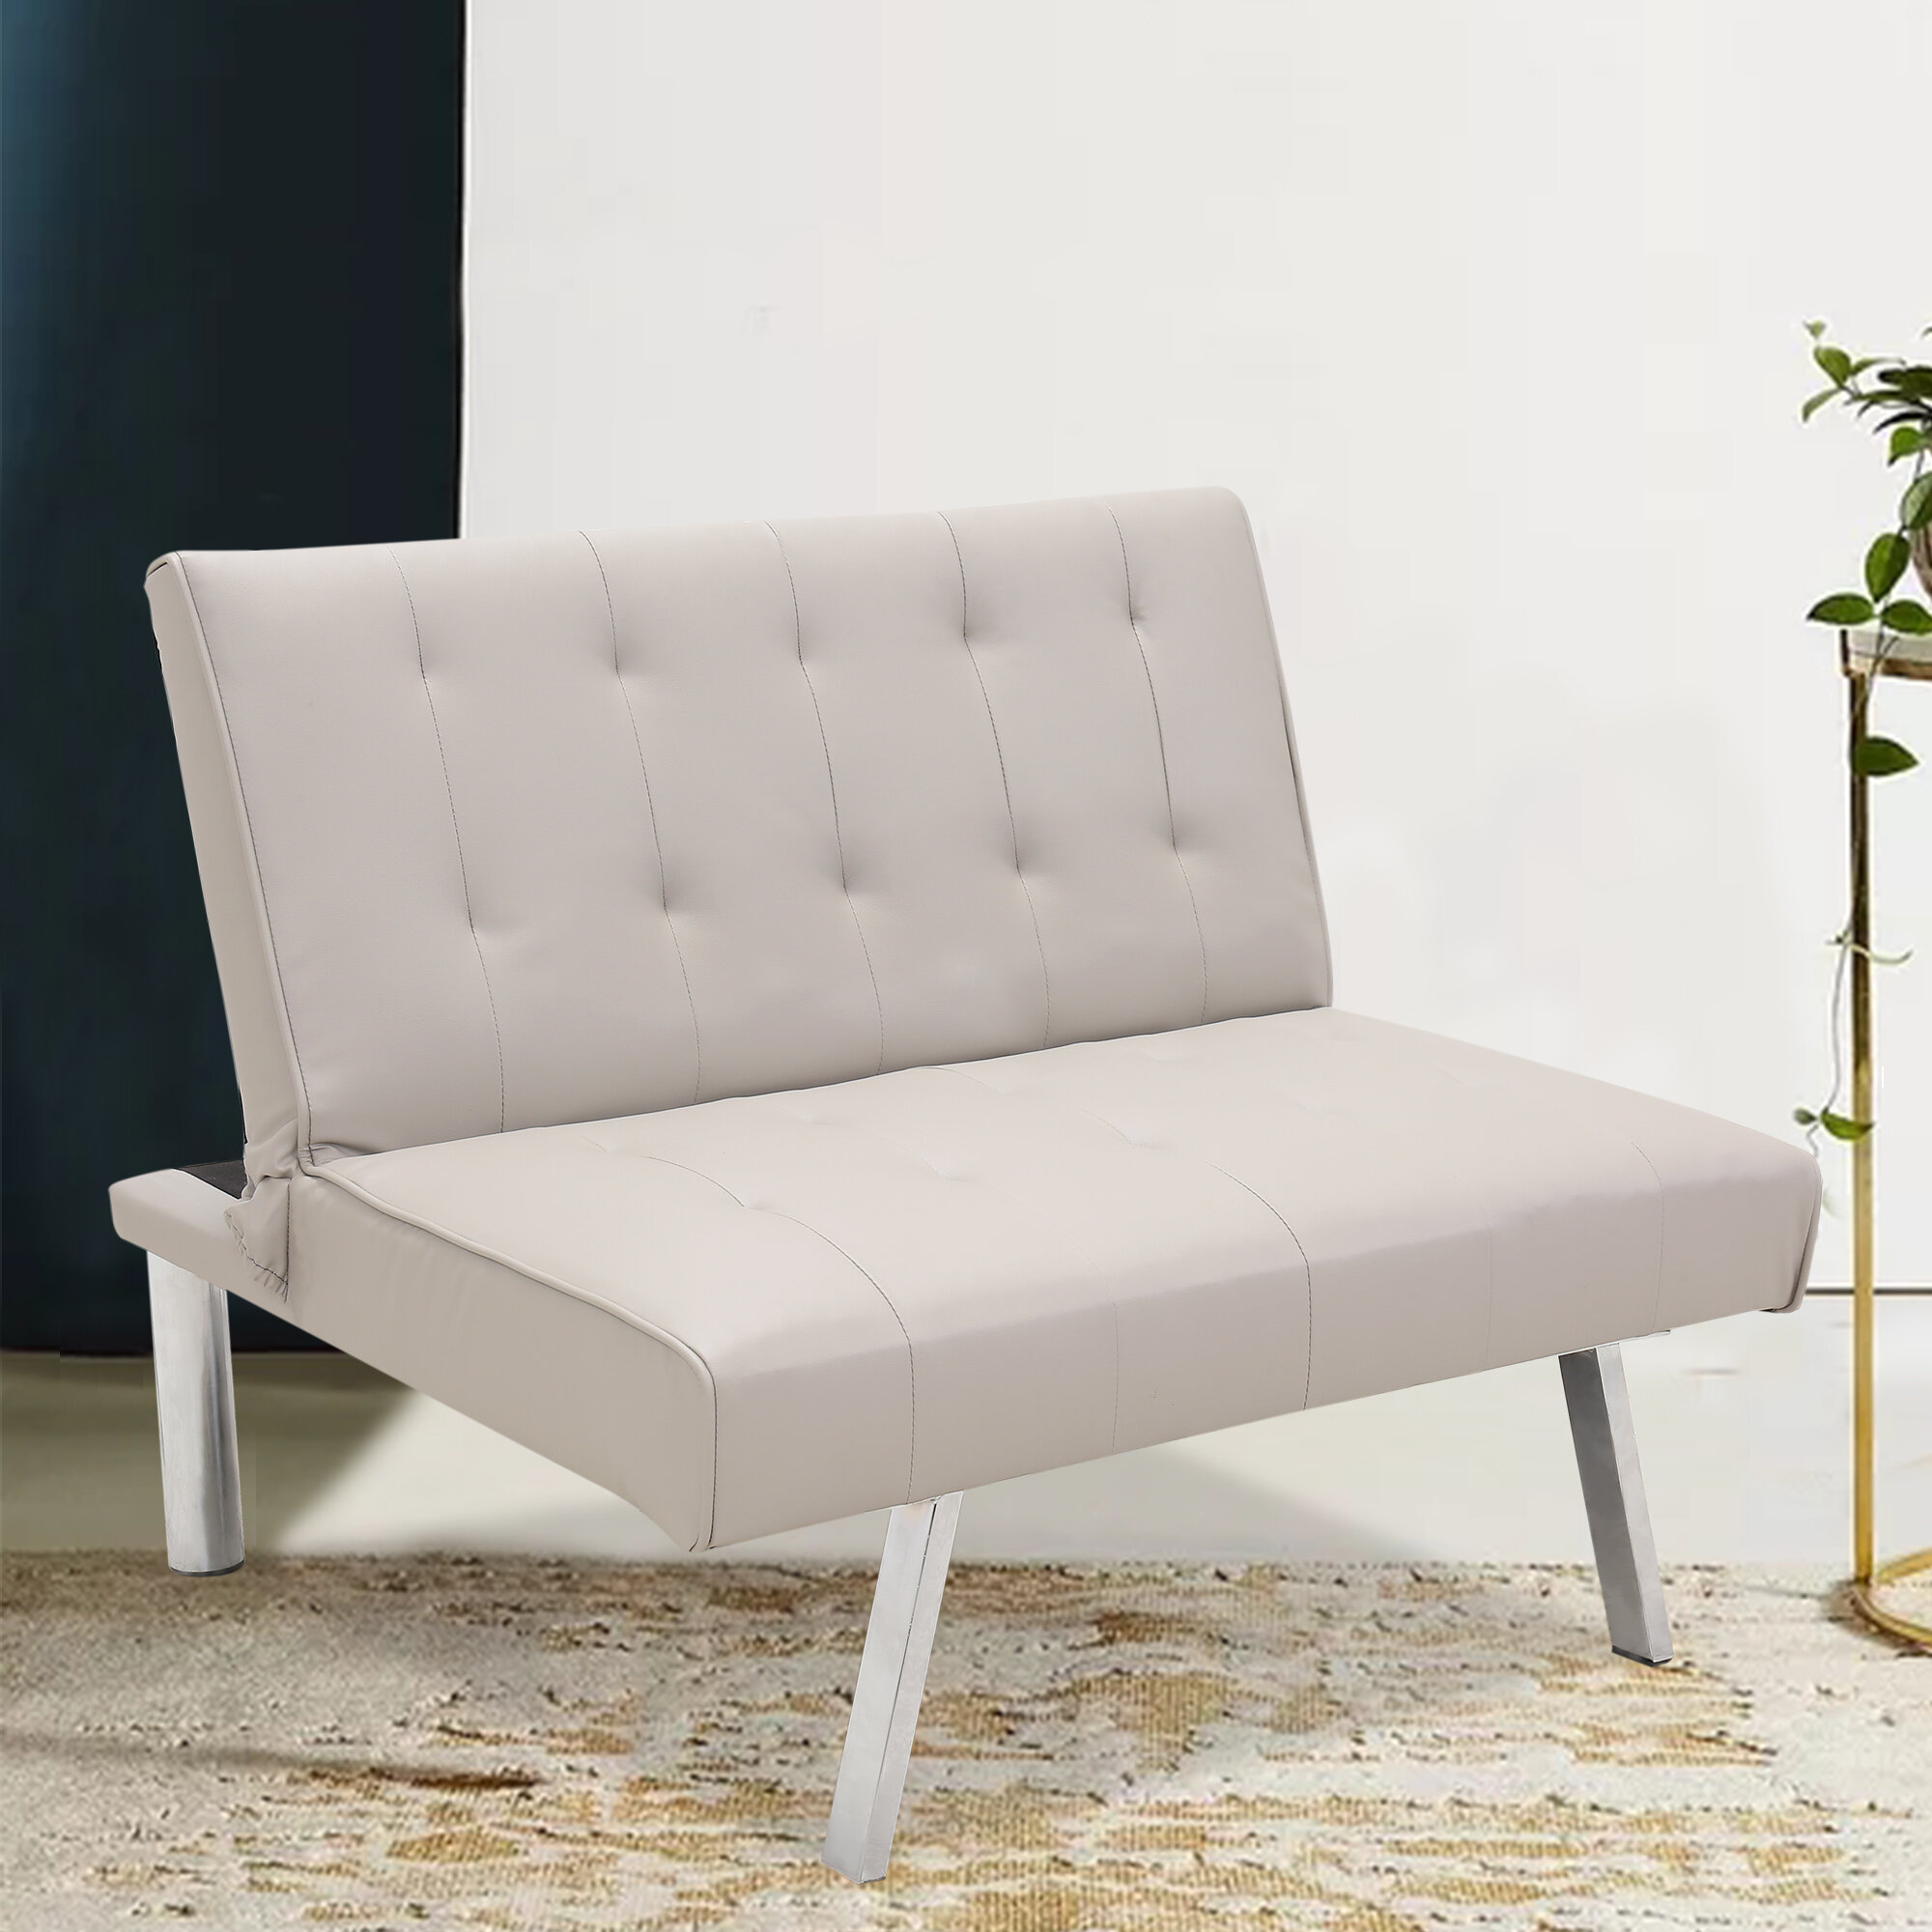 Wrought Studio Pu Leather Convertible Folding Sofa Chair Single Futon Sofa Couch